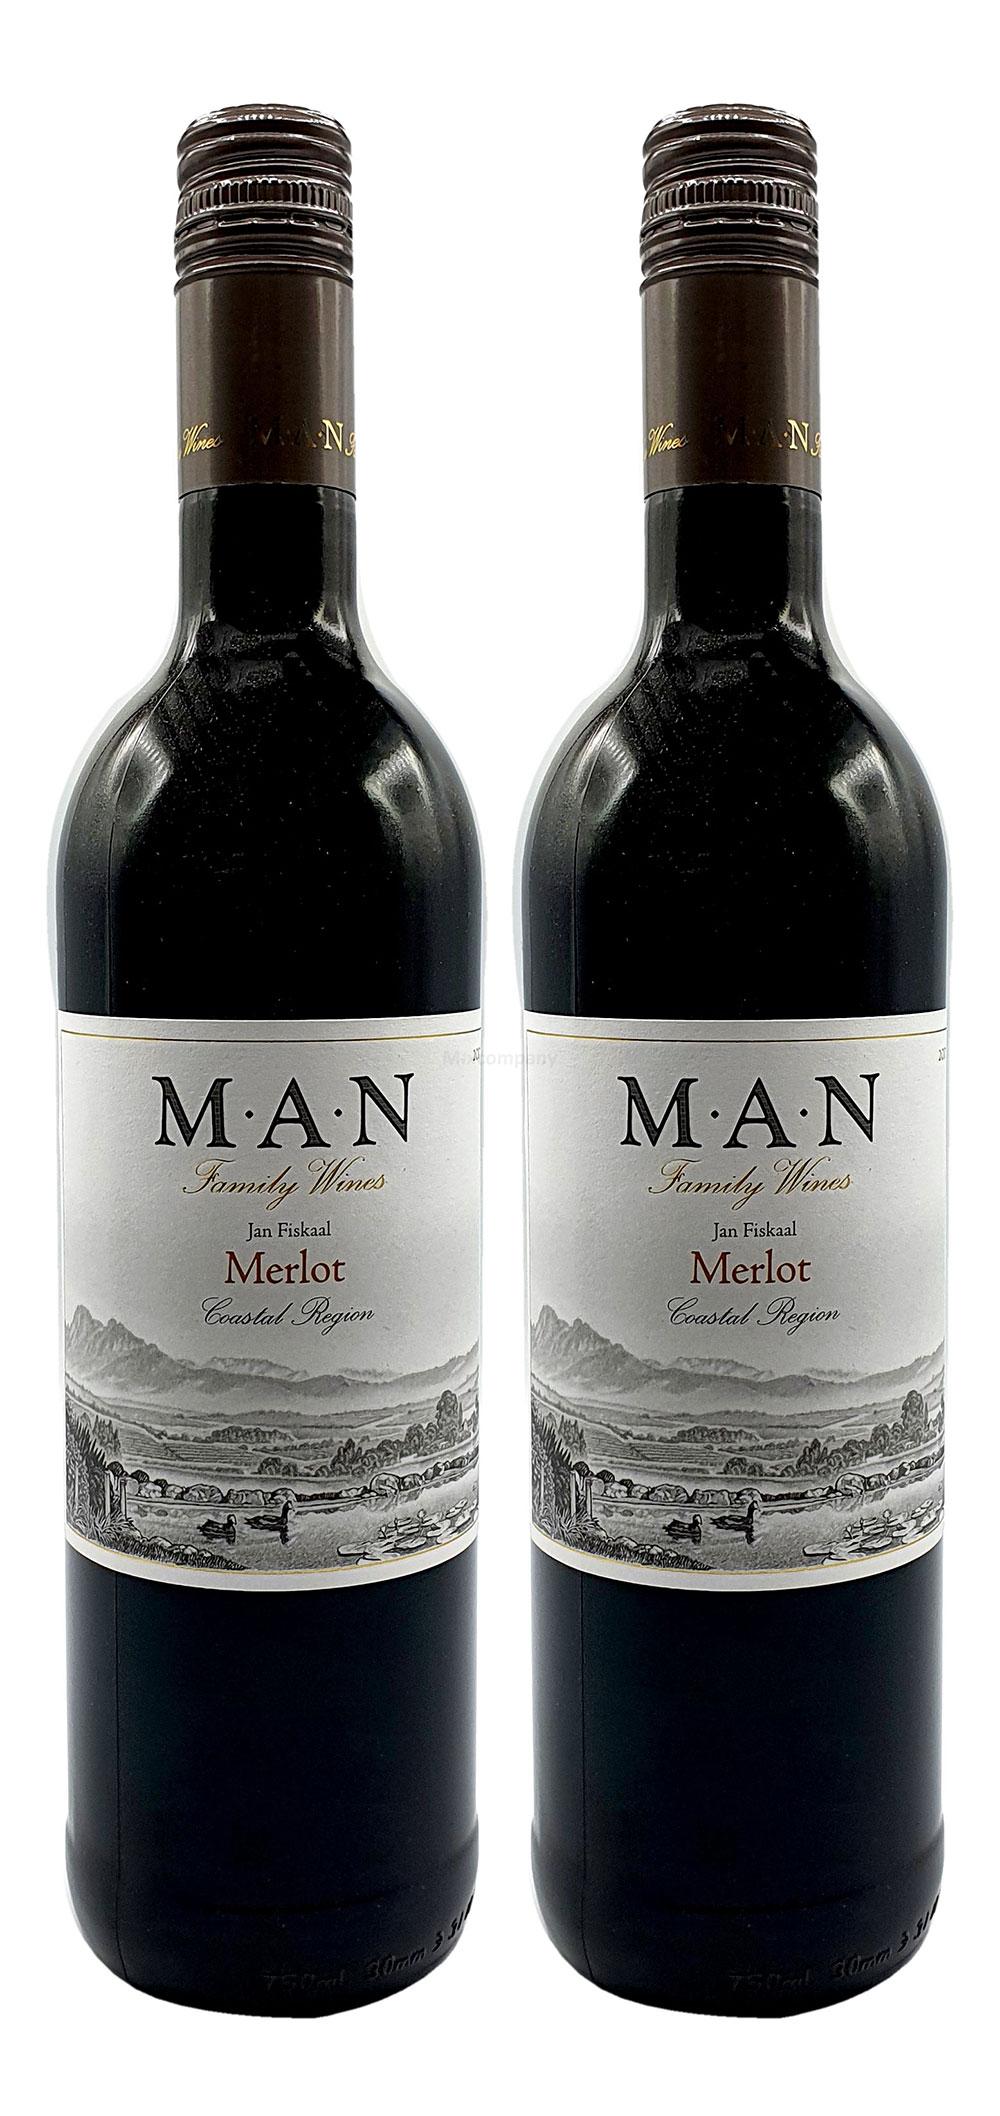 MAN Rotwein - 2er Set - 2x 0,75L (14% Vol) - Jan Fiskaal Merlot - Südafrika- [Enthält Sulfite]